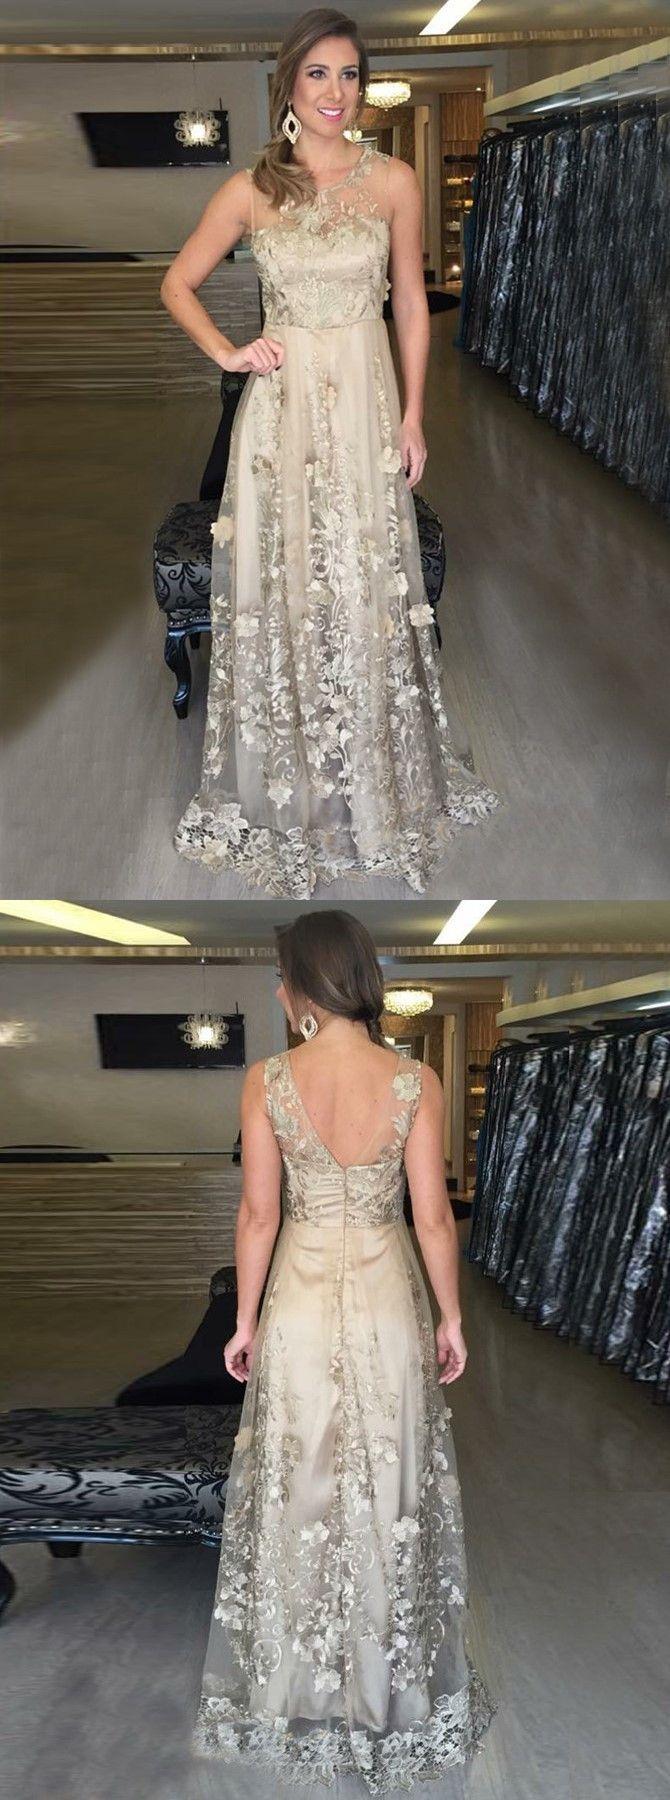 Aline scoop floorlength light champagne tulle appliques prom dress